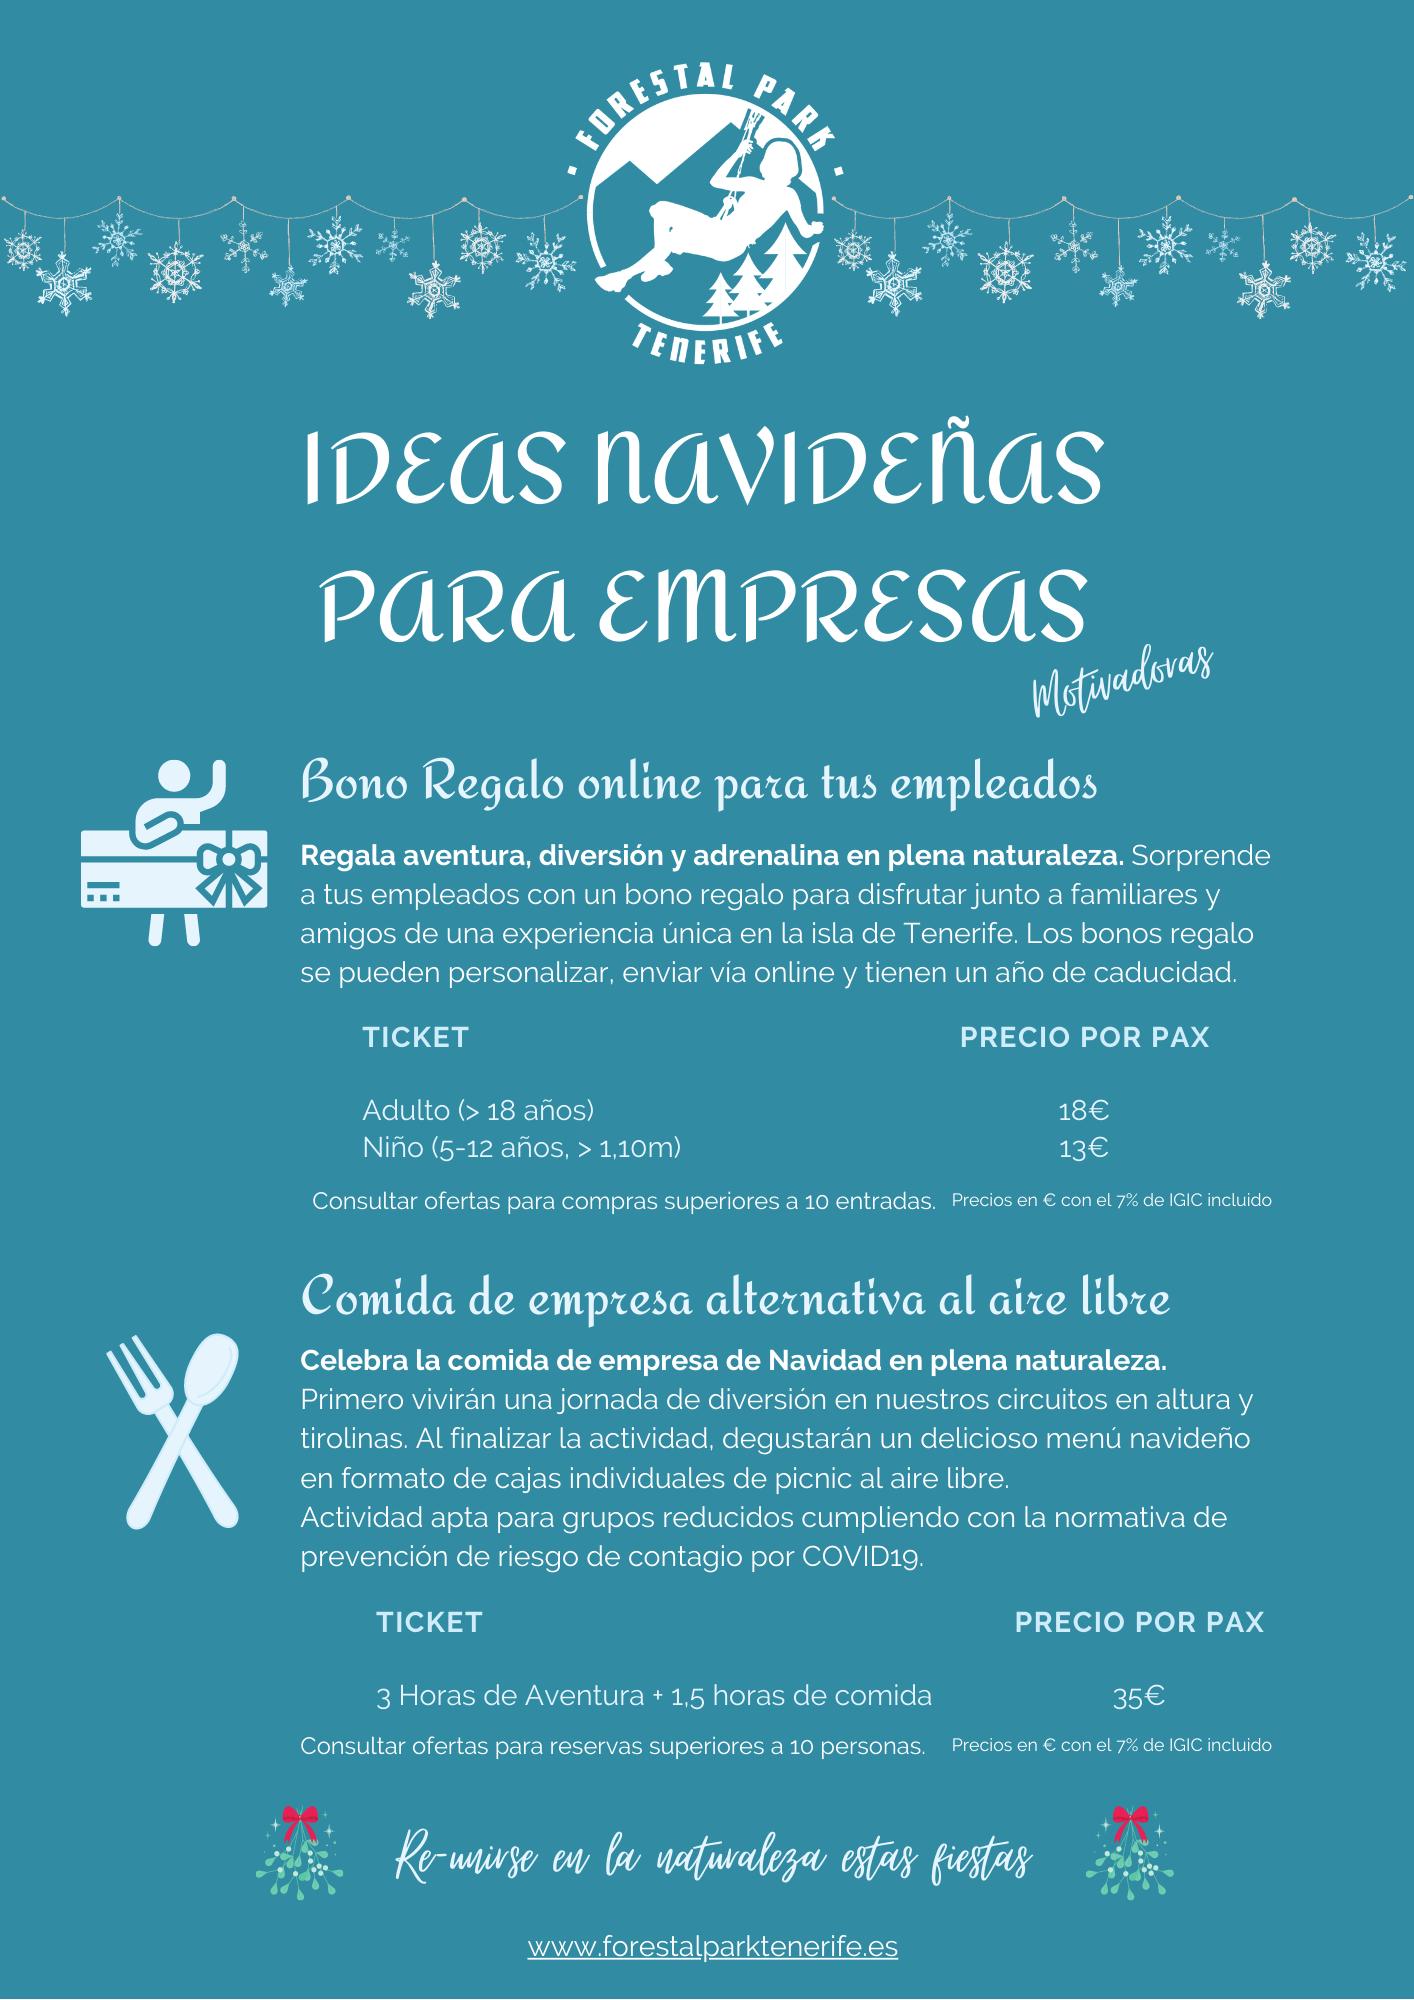 Navidad 2020 ideas para actividades para empresas de Tenerife